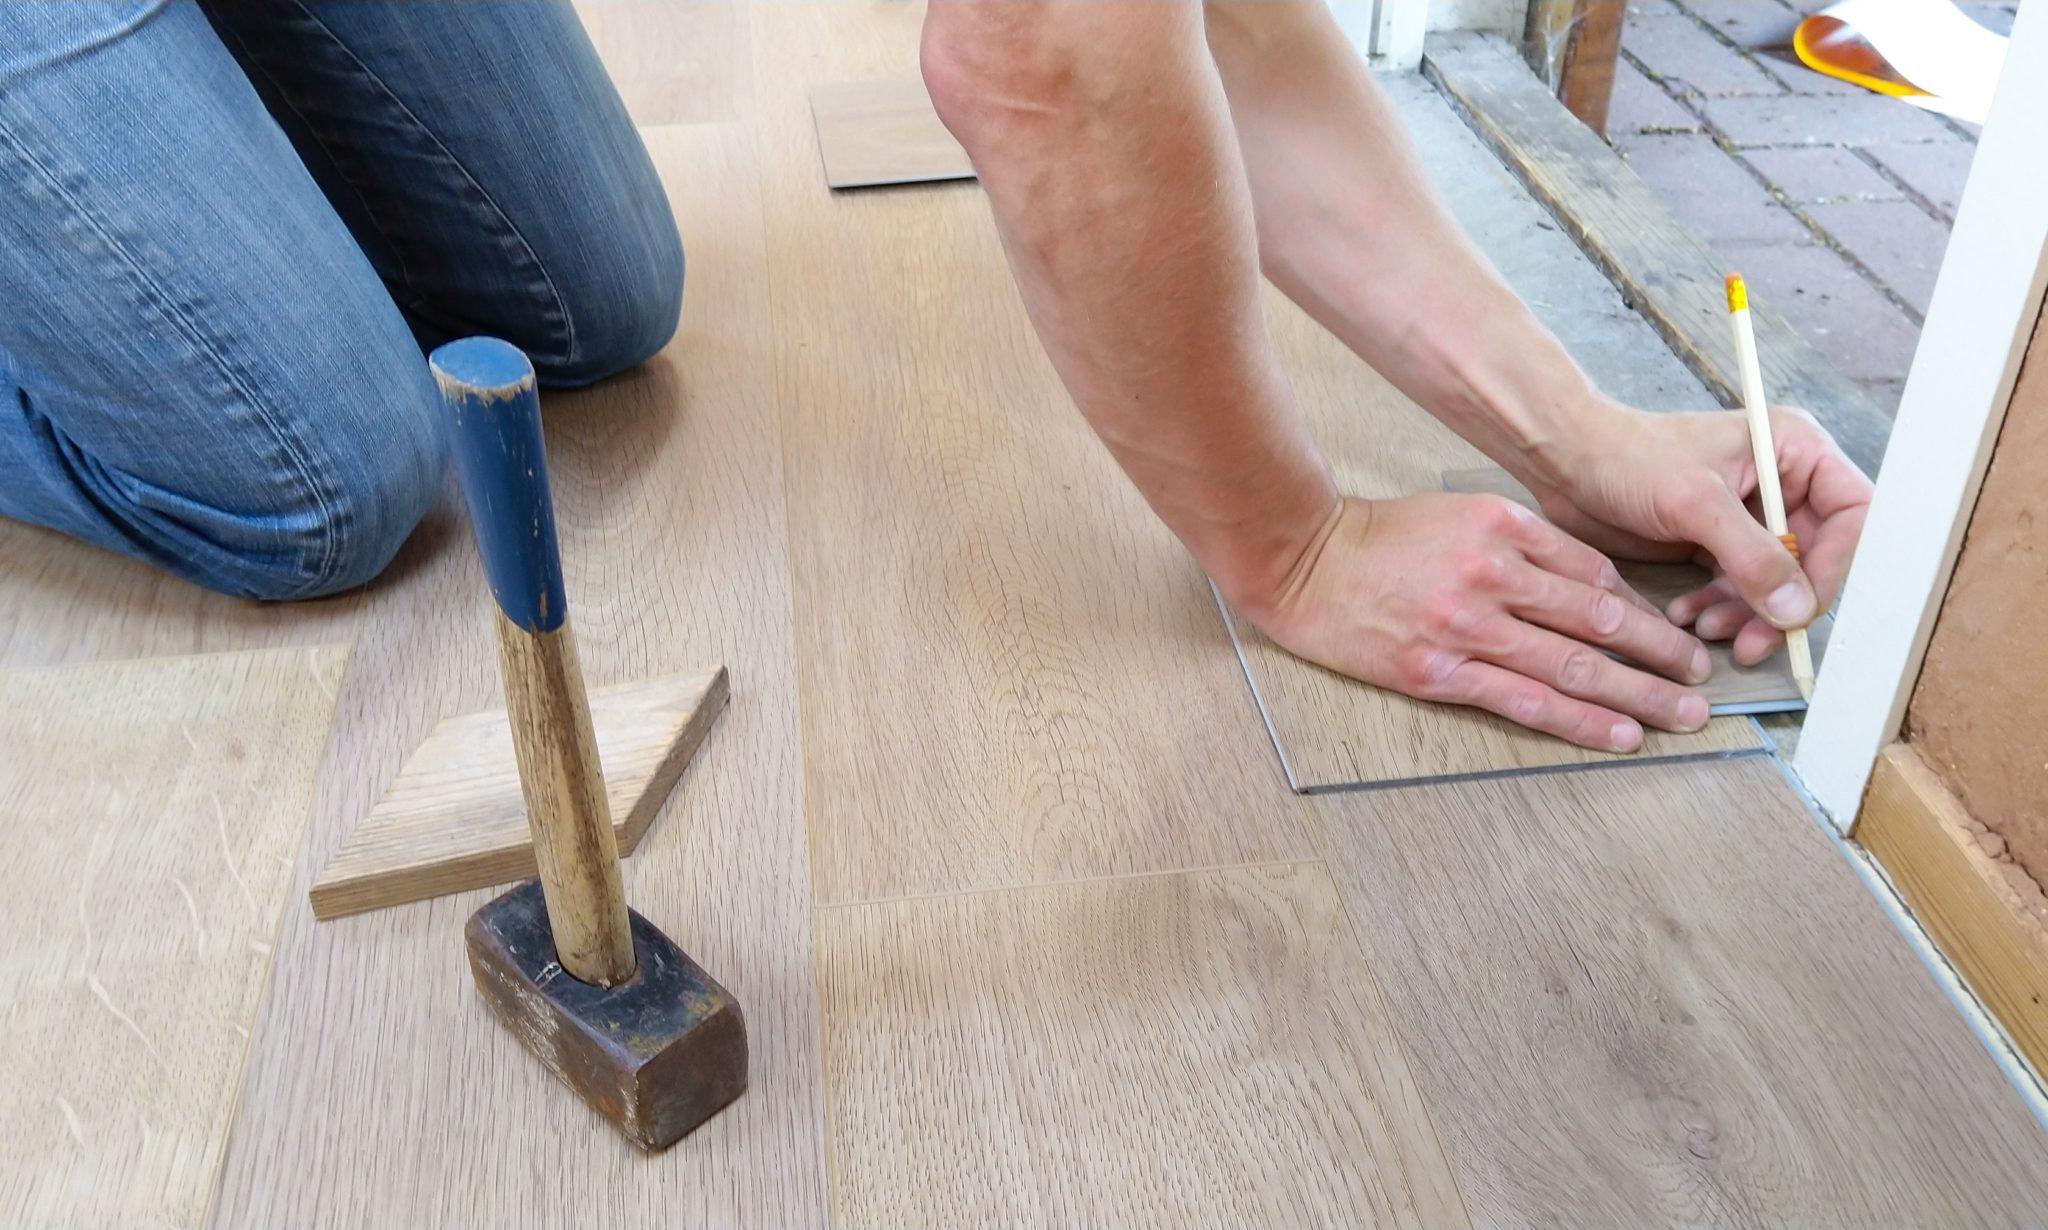 flooring in knoxville, knoxville flooring, knoxville tile, tile installation knoxville, knoxville handyman